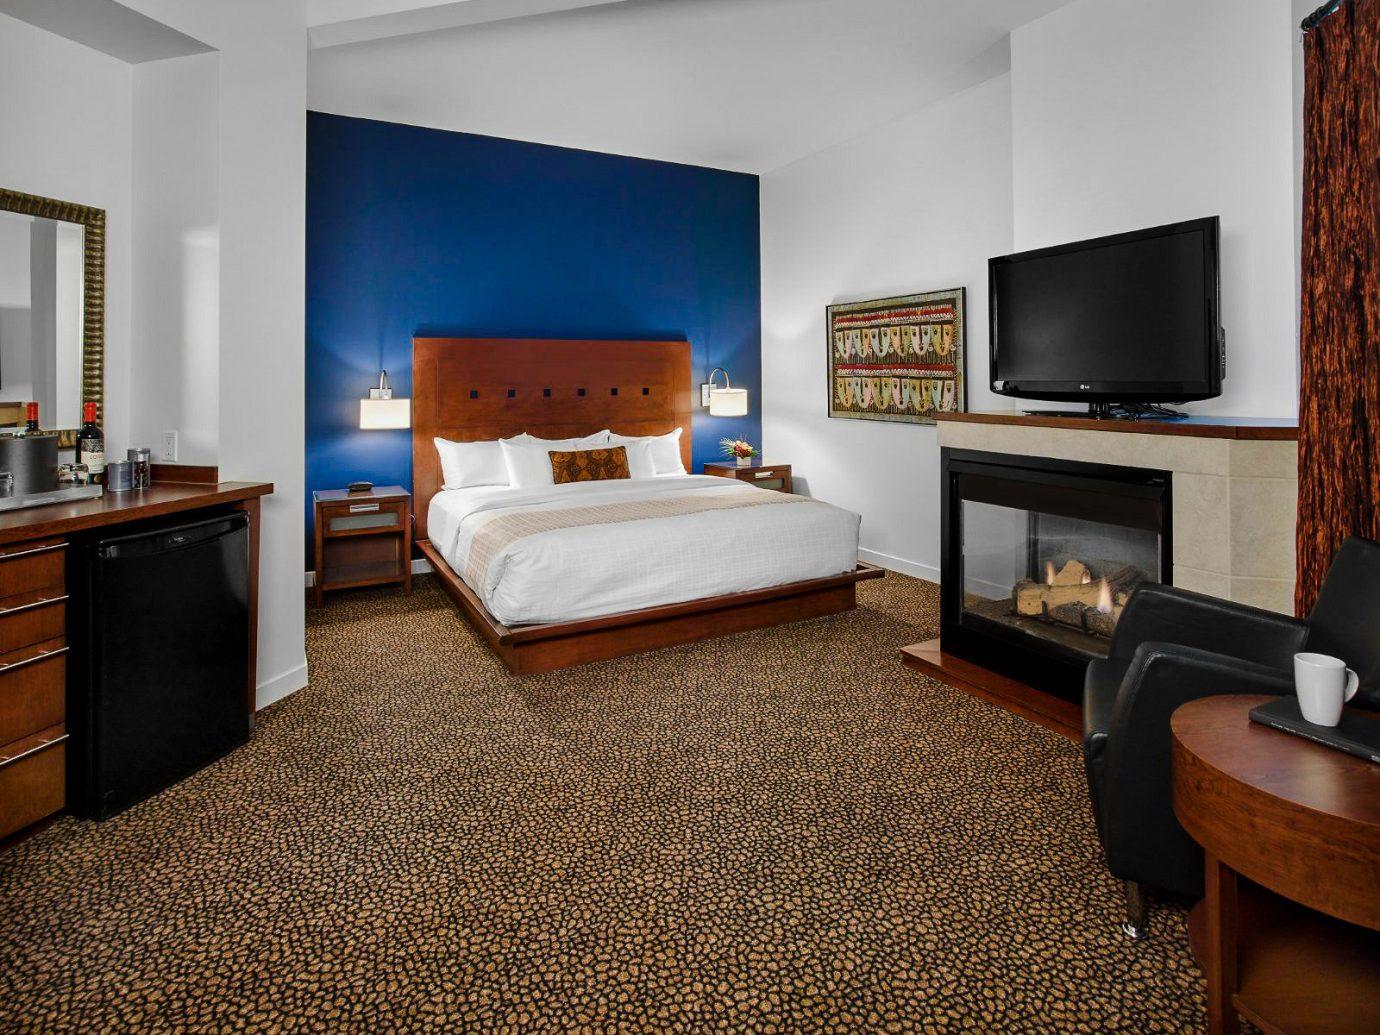 Alberta Canada Road Trips indoor wall floor room Living television ceiling Suite interior design real estate flooring Bedroom flat hotel furniture area